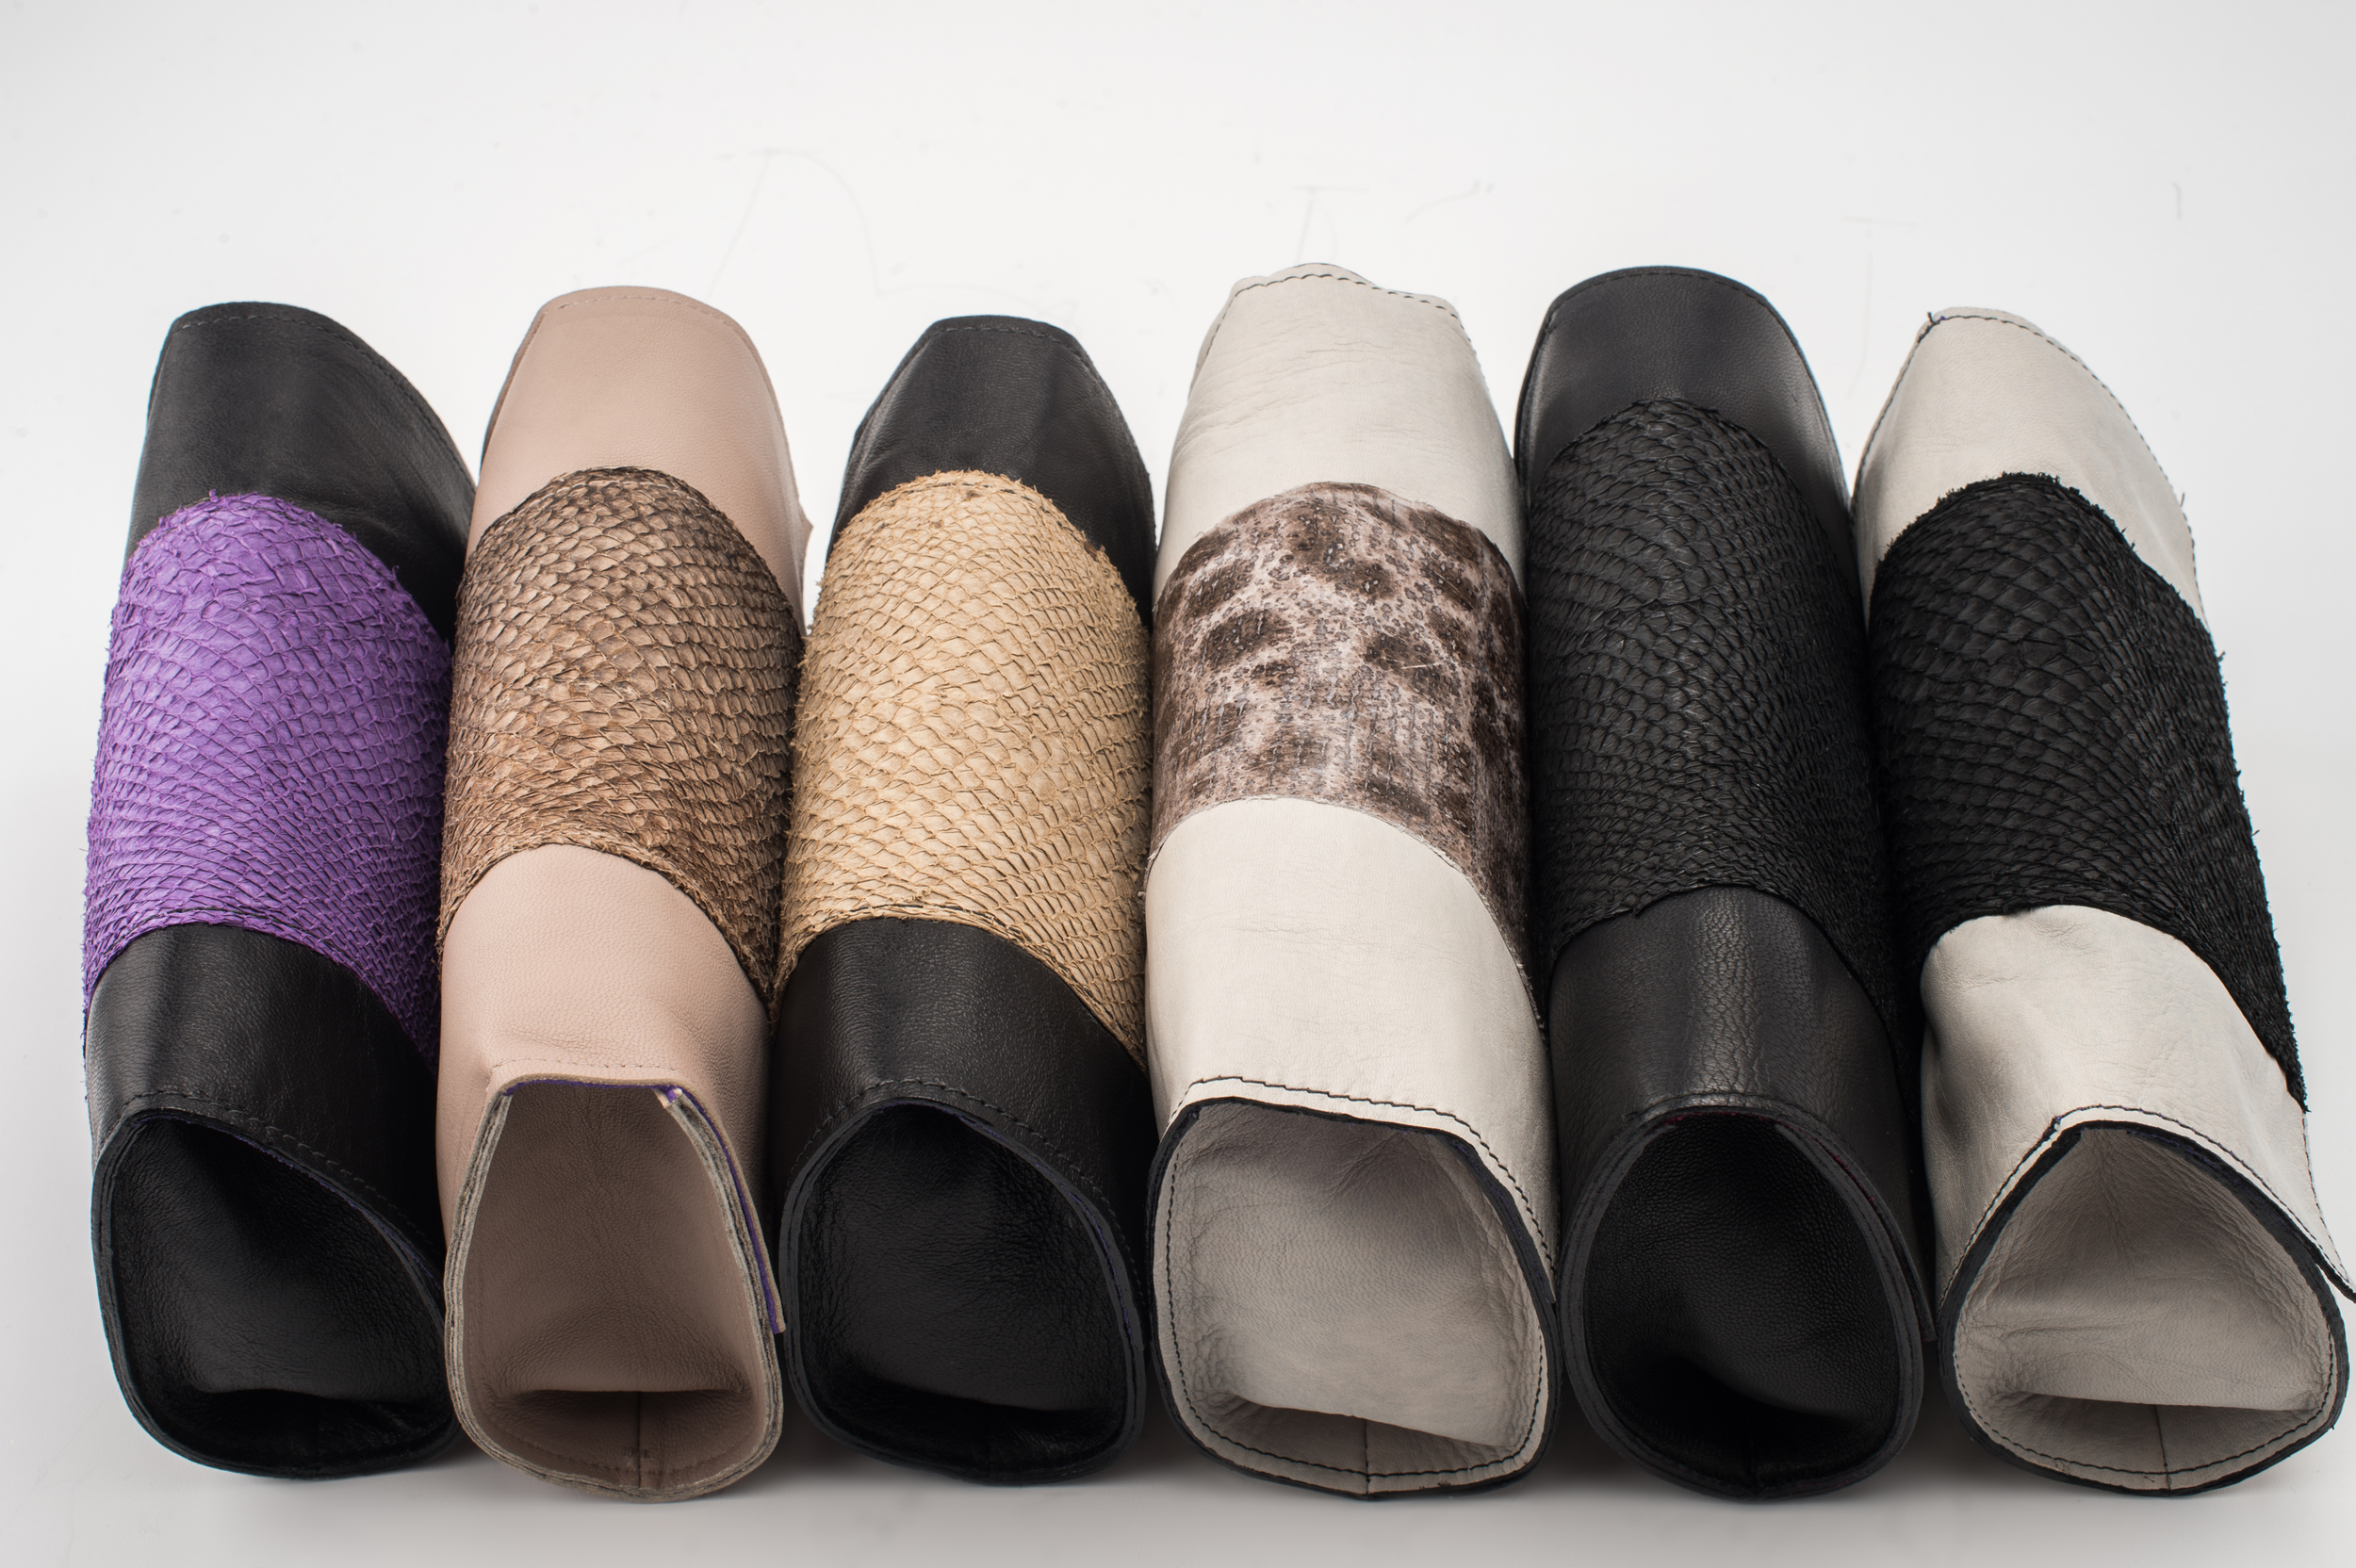 Bronagh Holmes Luxury - Avani - Selection of various leathers